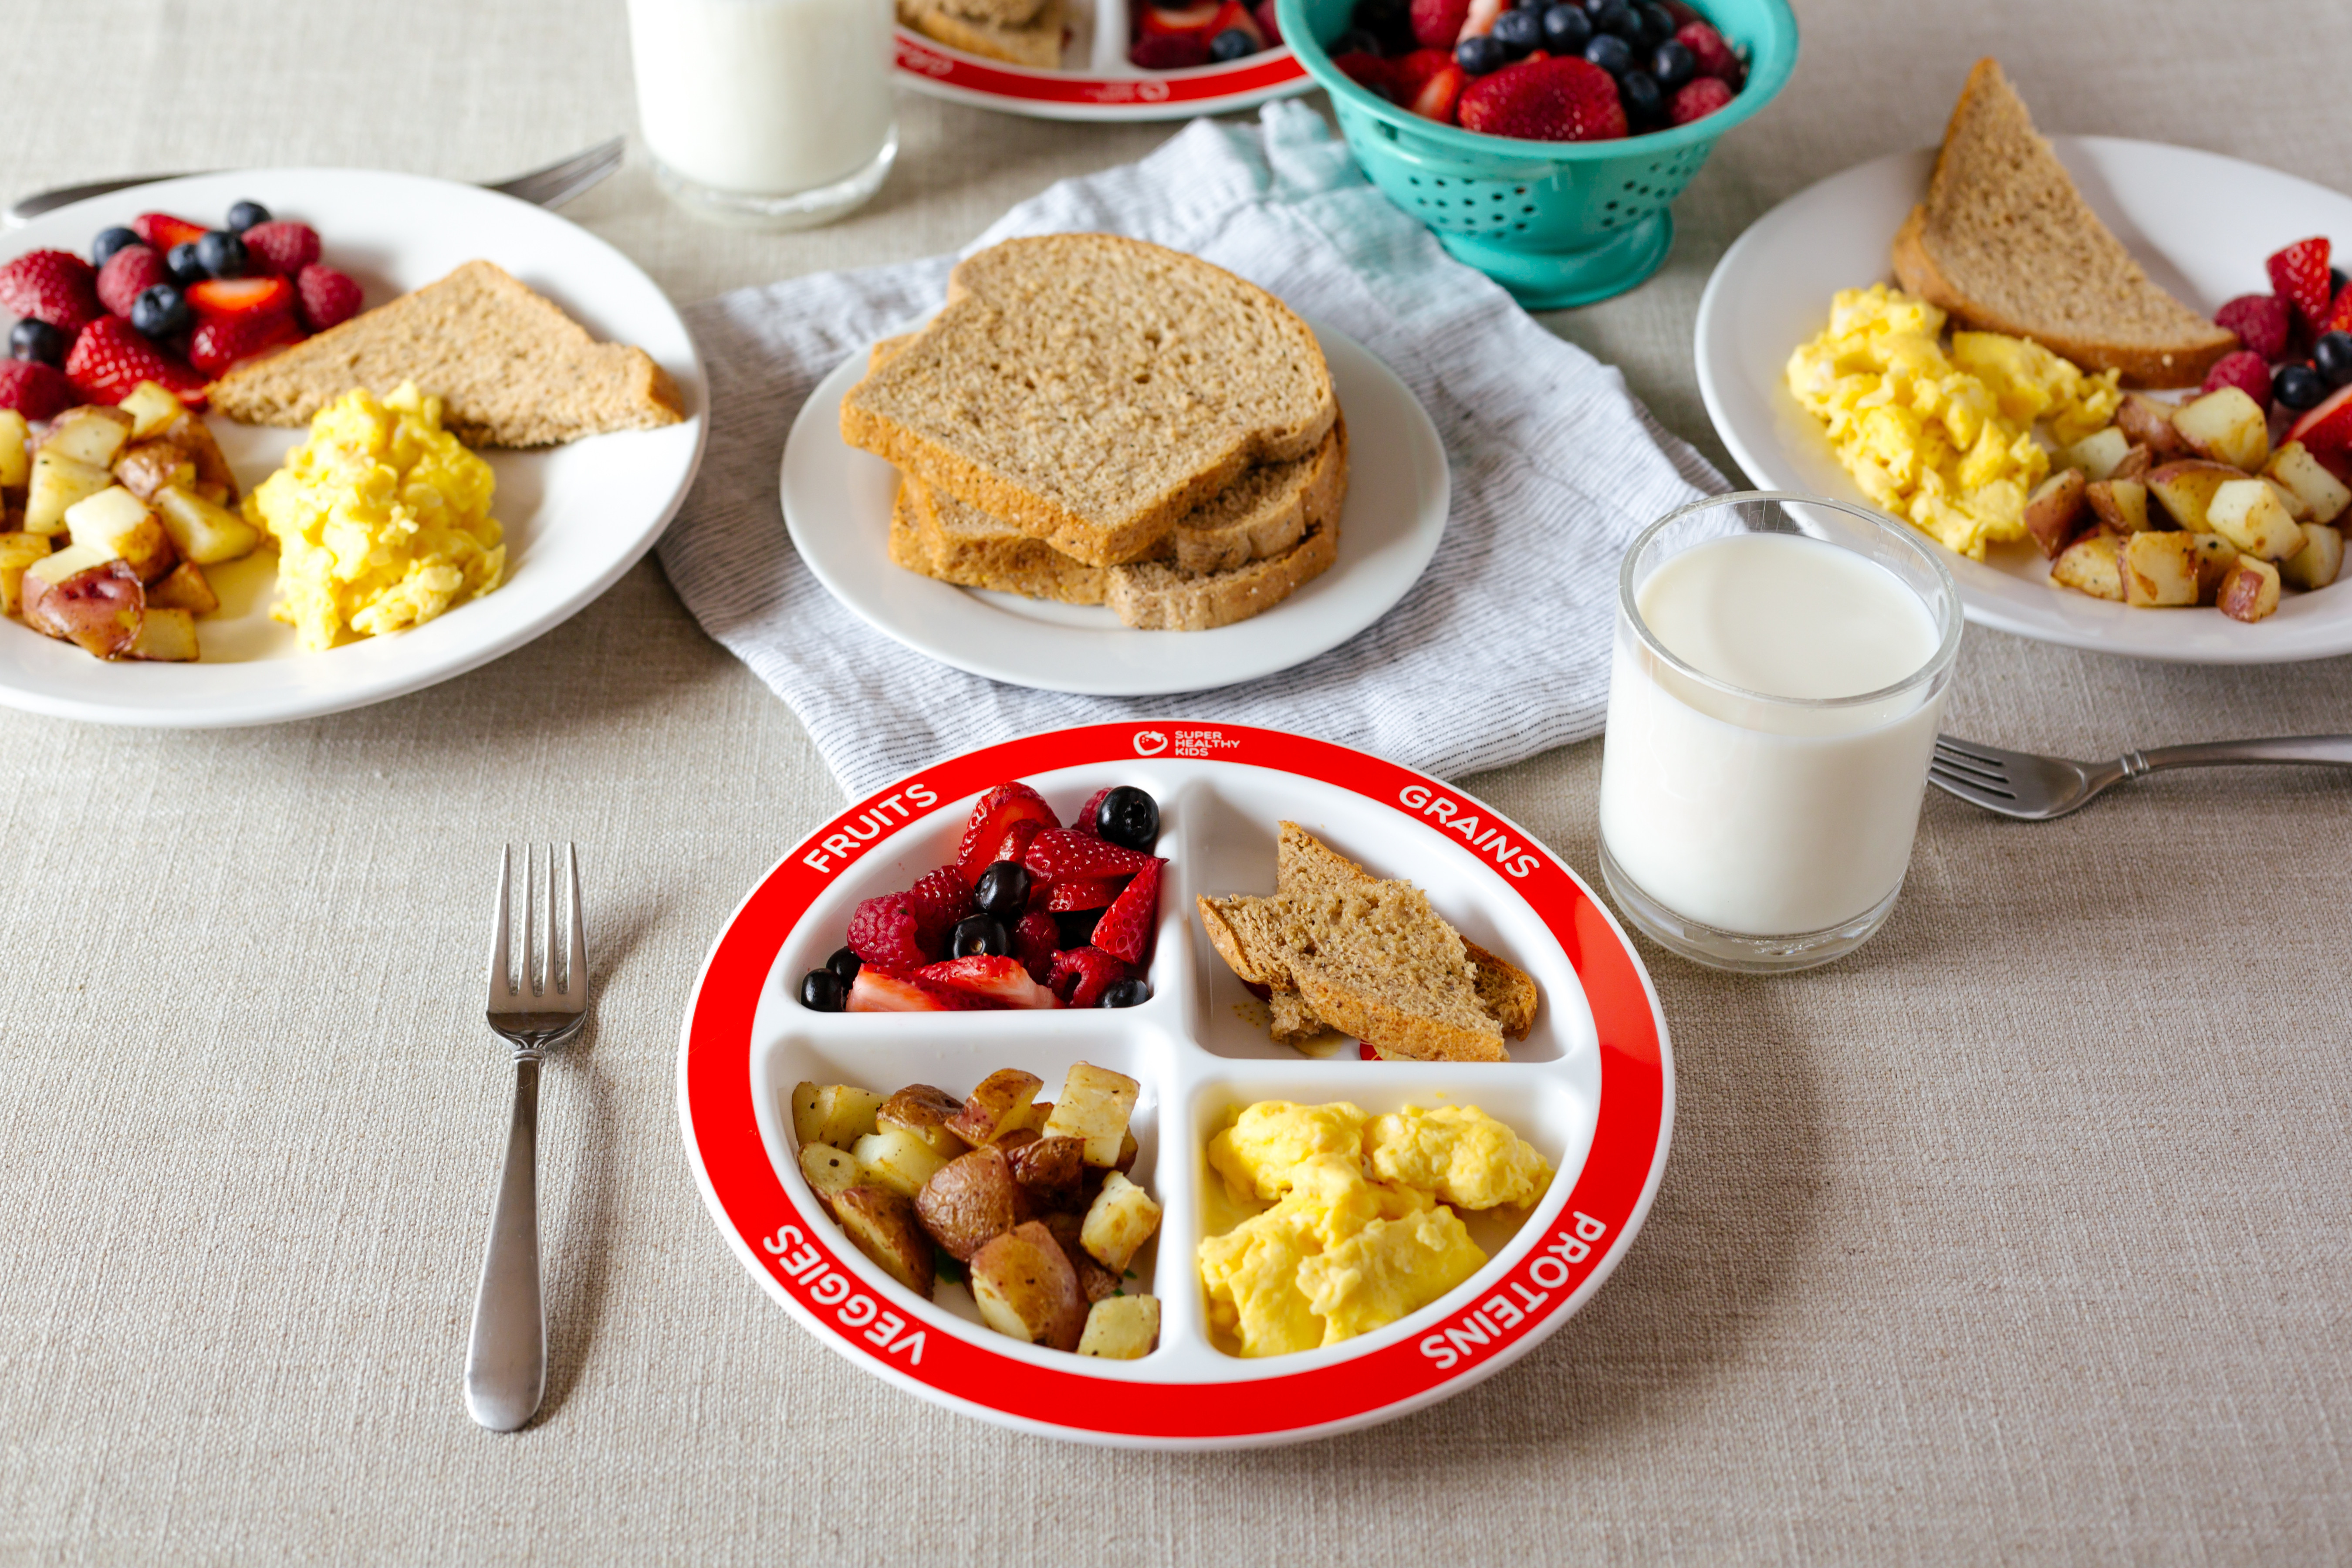 Healthy Food For Breakfast  Healthy Balanced Breakfast with MyPlate